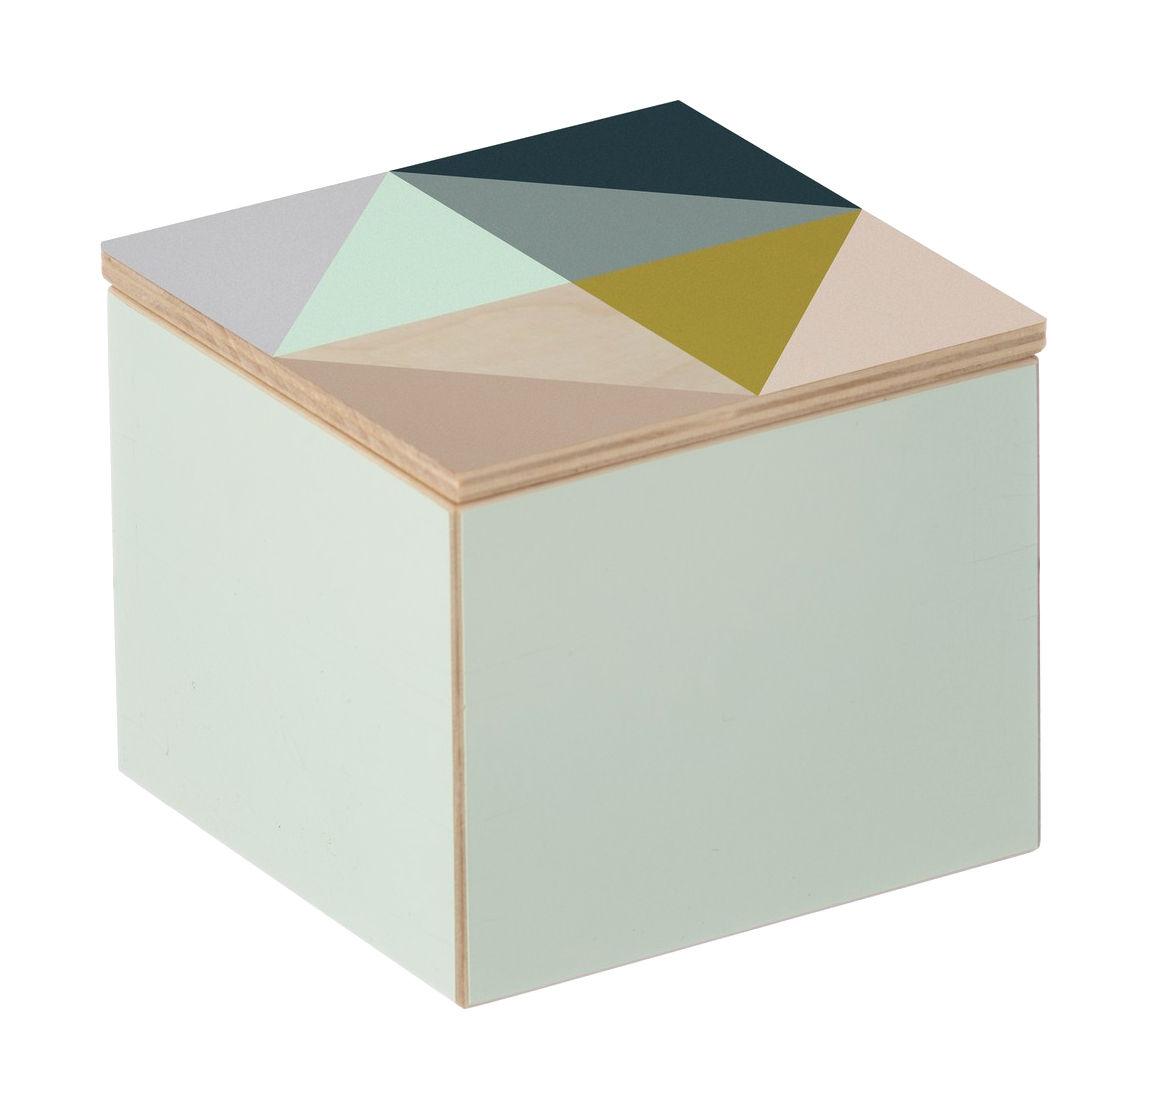 Decoration - Decorative Boxes - Clint Box Box - 10 x 10 cm by Ferm Living - Multicolored - Birch plywood